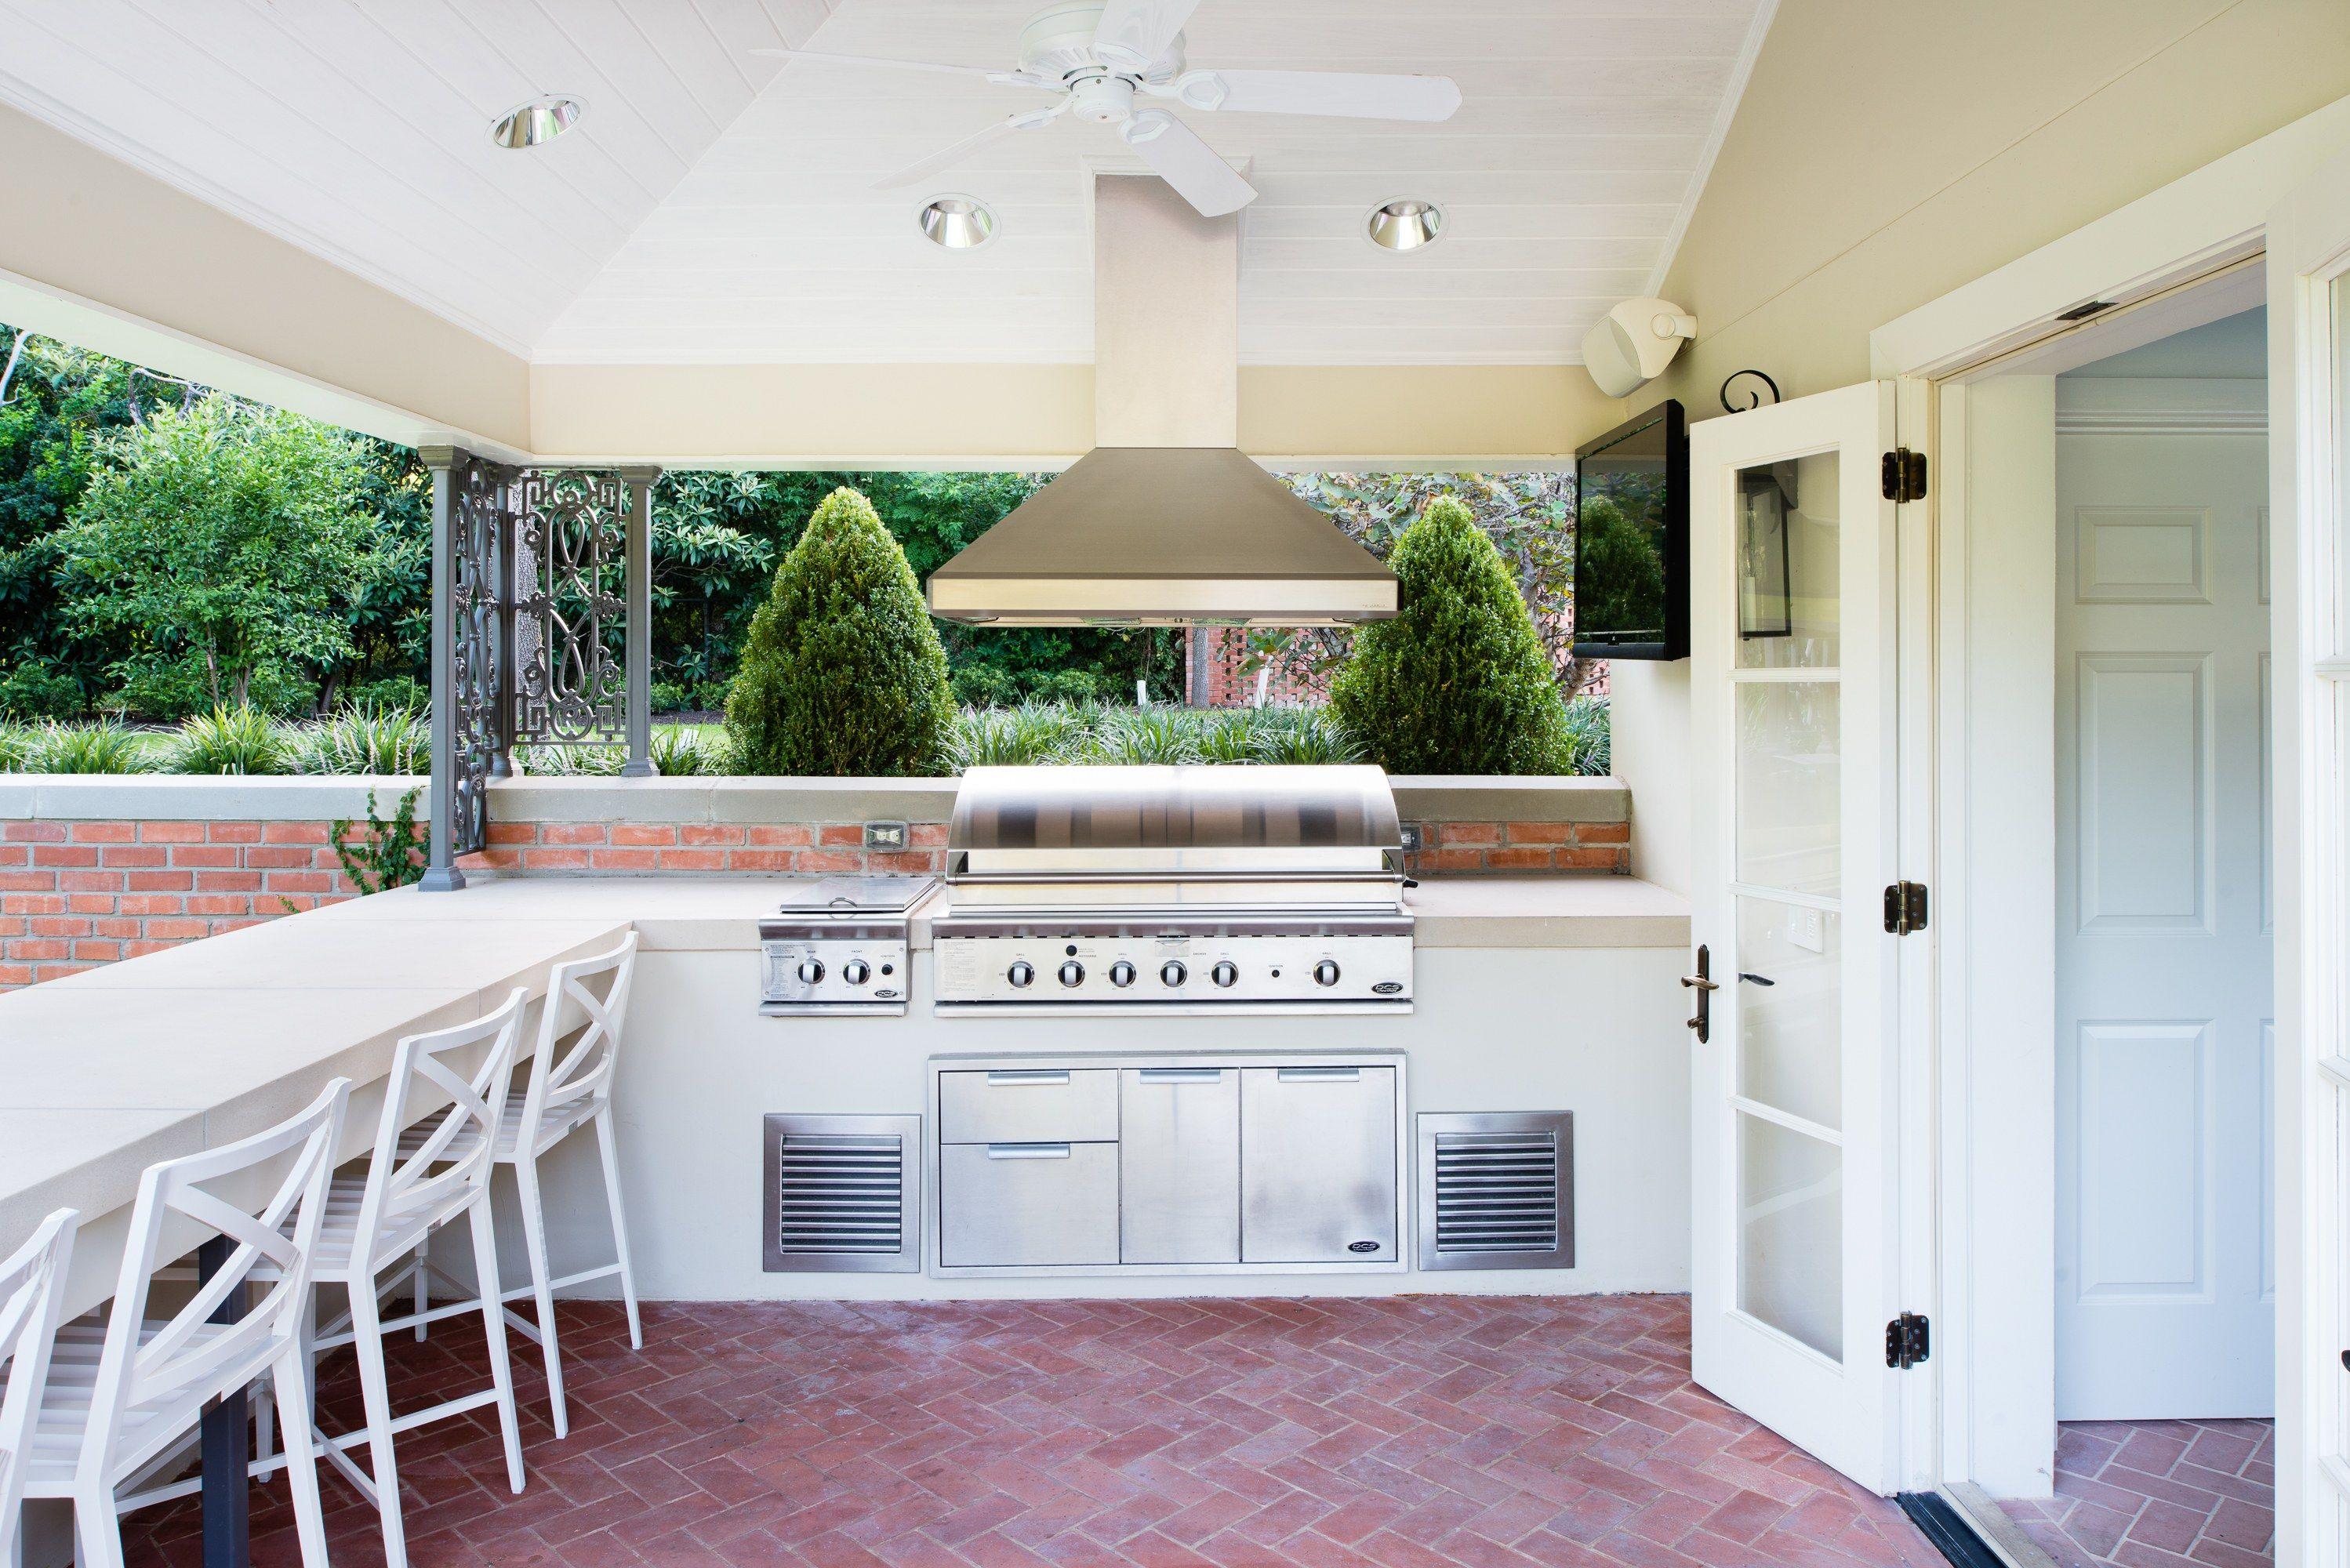 A 1950s Poolhouse Gets A Tastefully Modern Makeover Outdoor Kitchen Design Outdoor Kitchen Design Layout Pool Houses